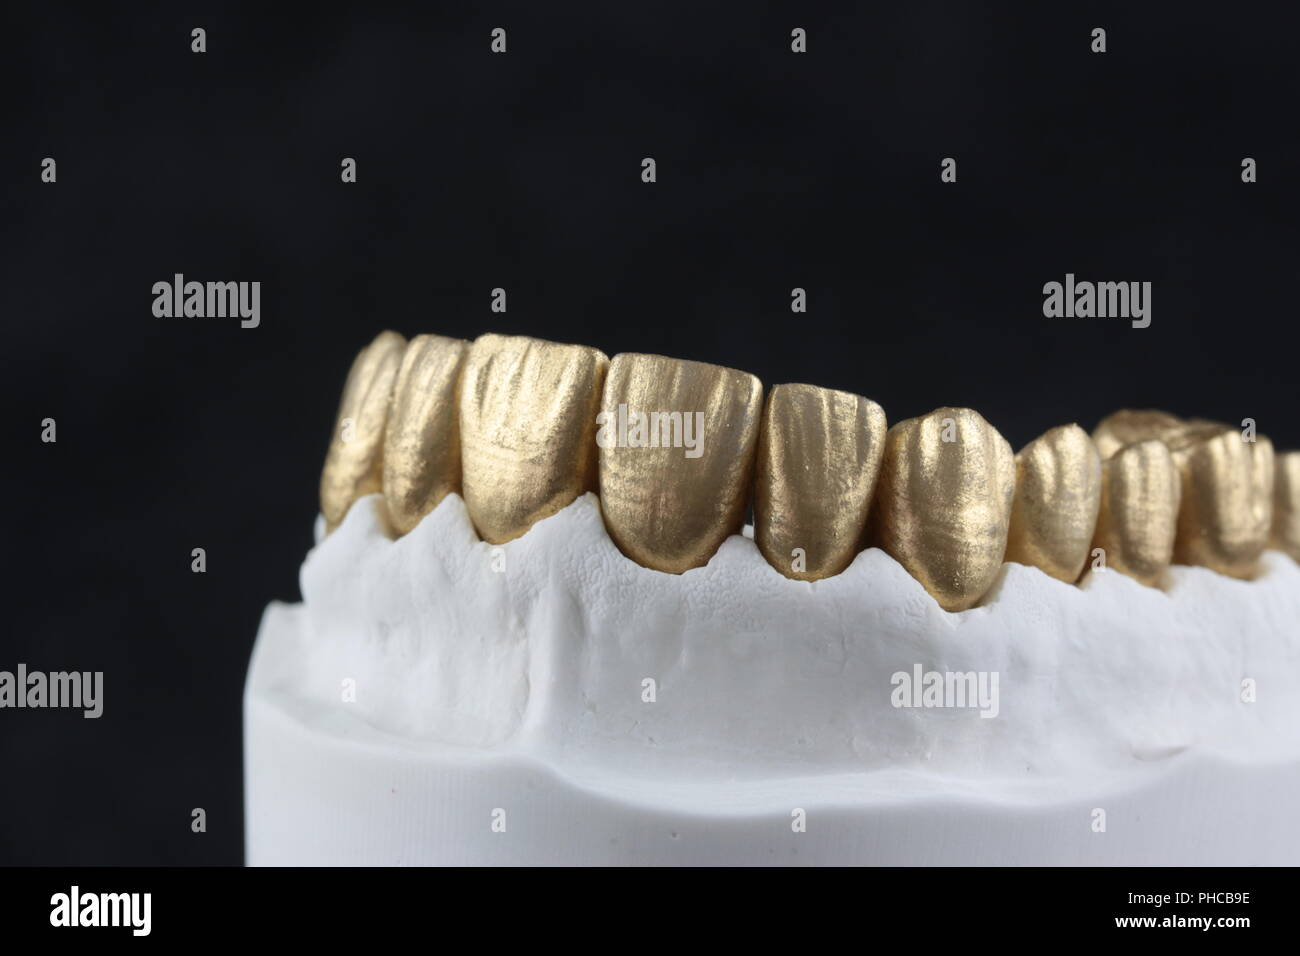 Dental Work - Stock Image